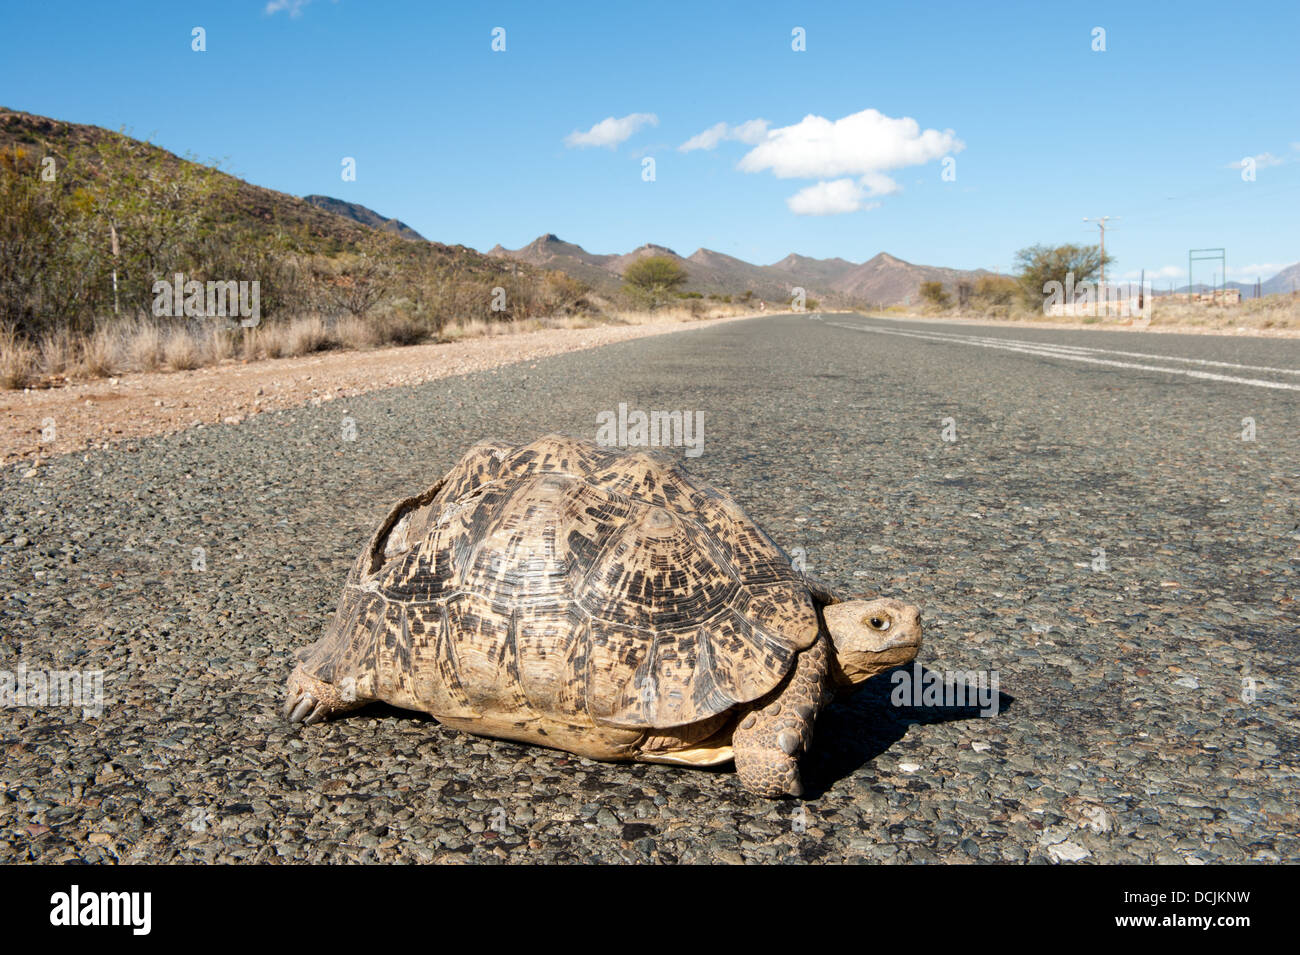 Leopard tortoise (Geochelone pardalis) on the road, near Oudtshoorn, South Africa - Stock Image